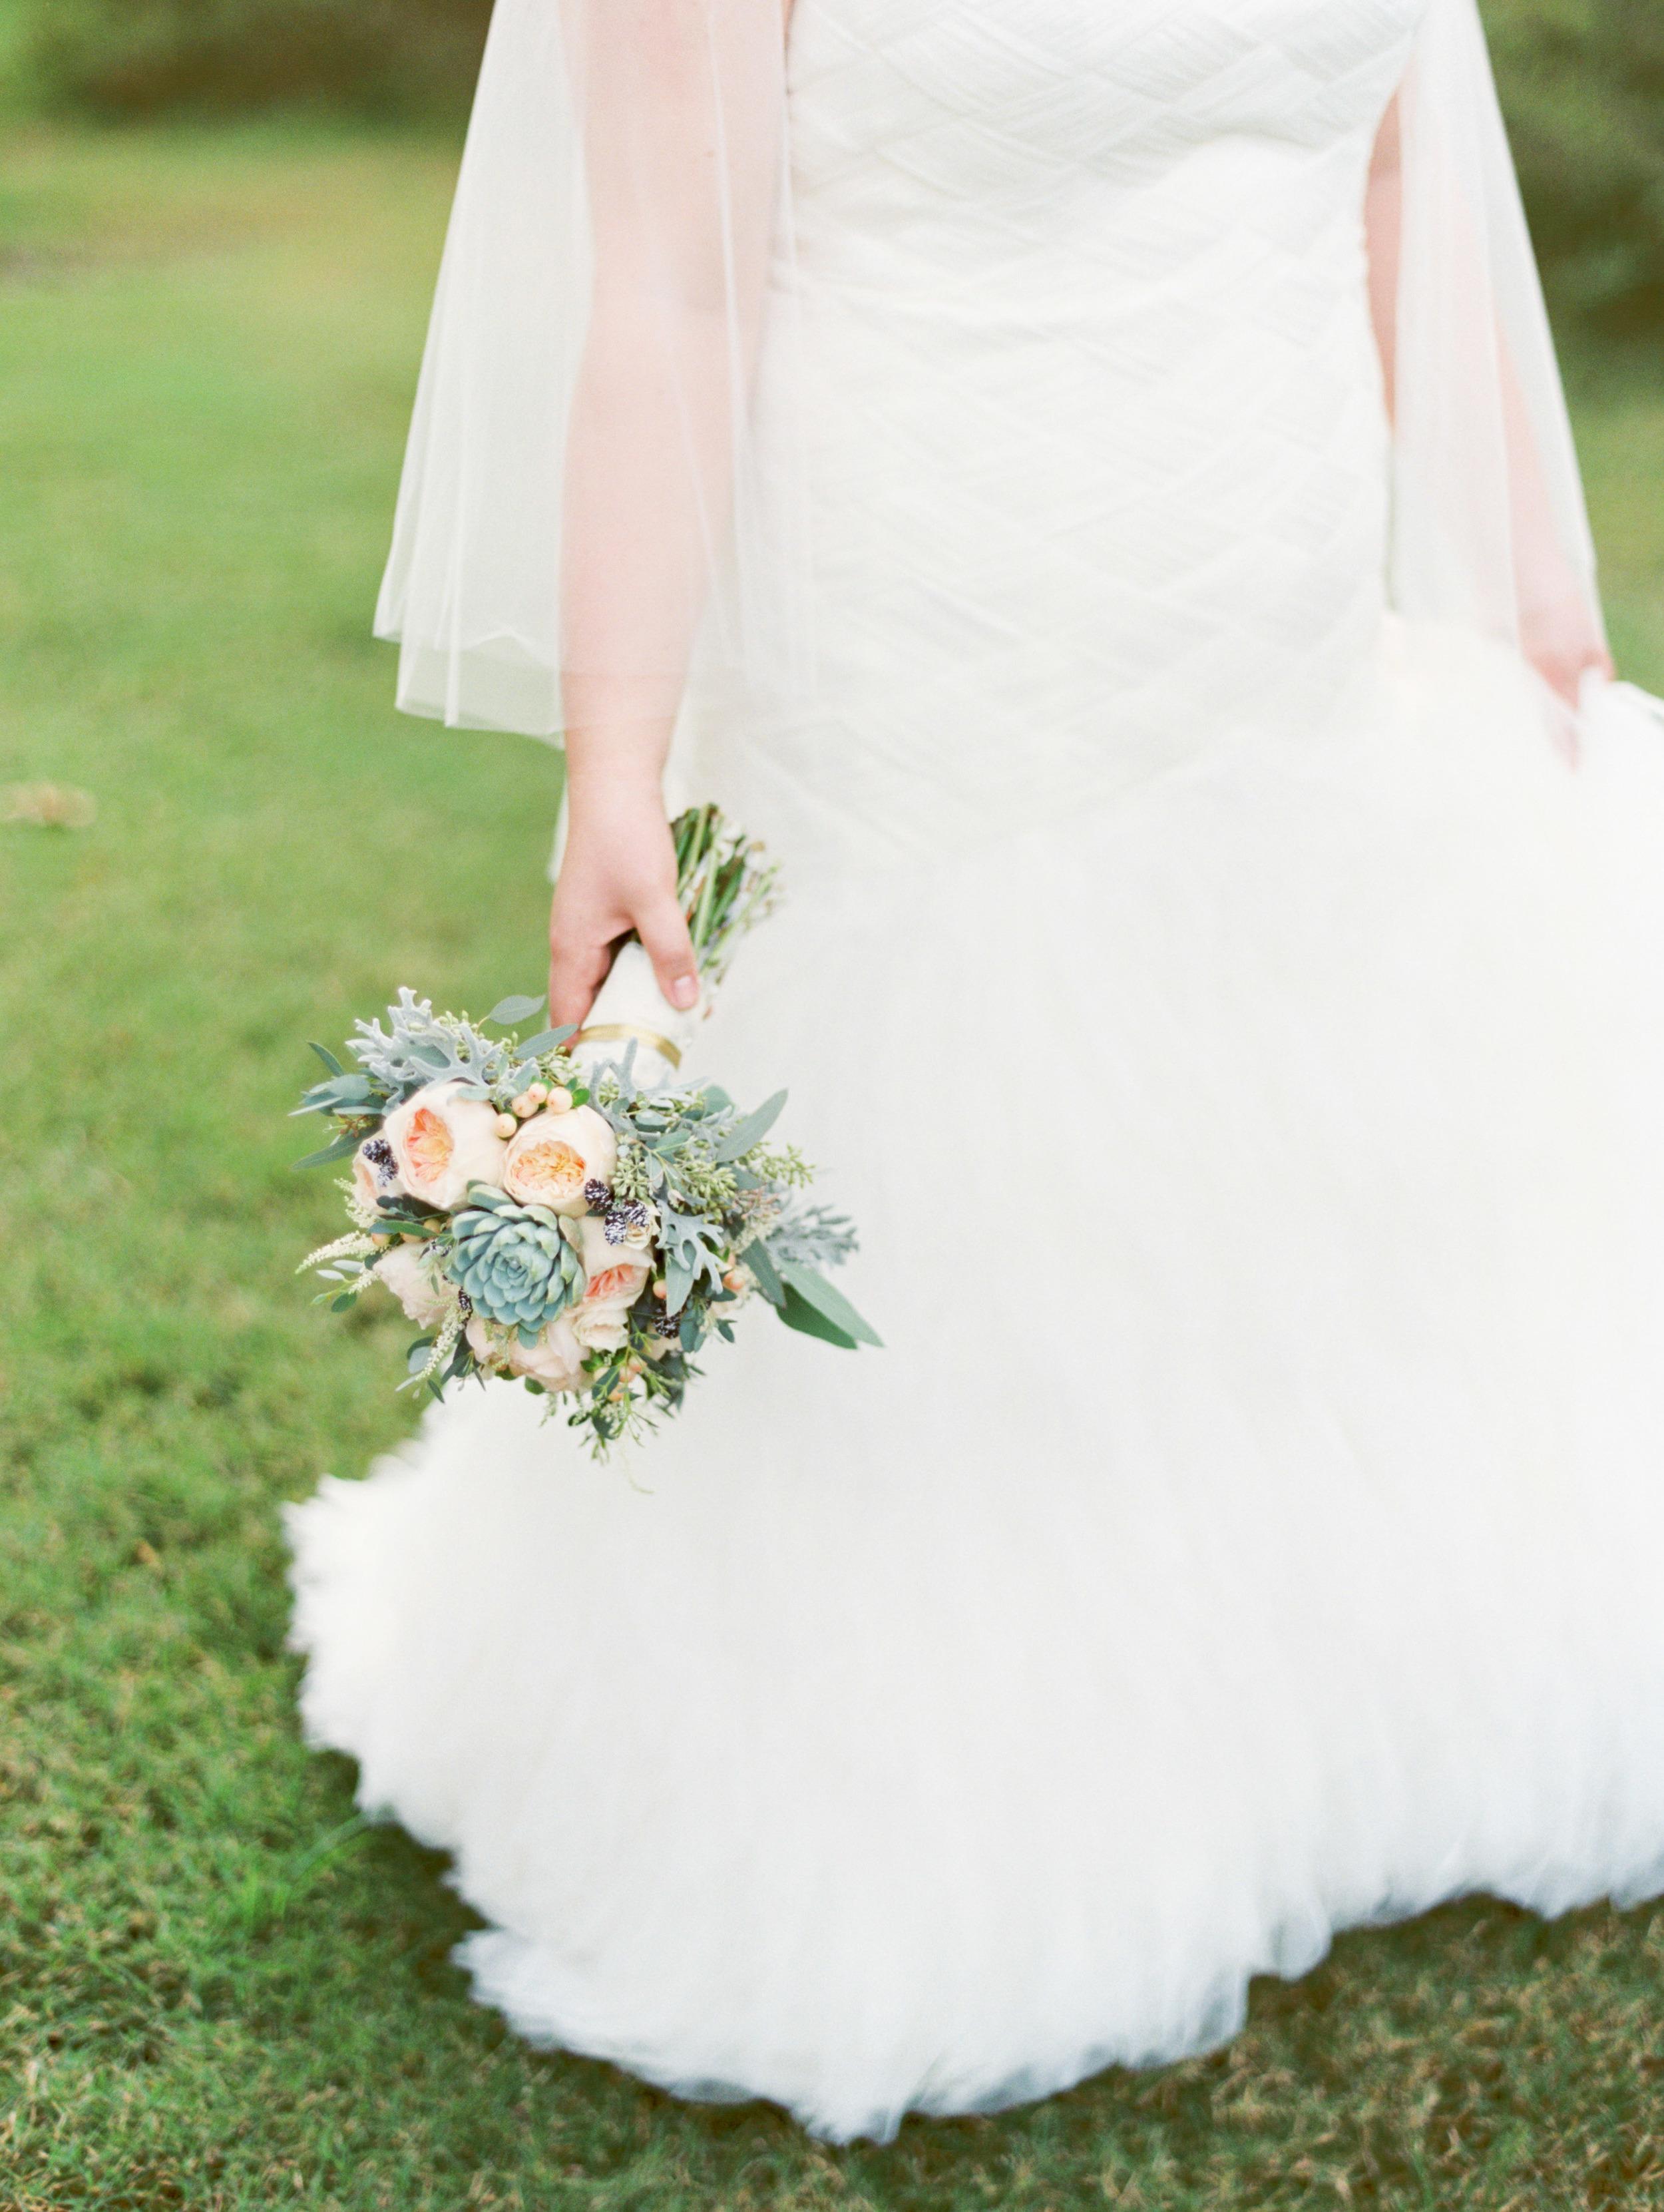 Sarah Best Photography - Elizabeth's Bridals - 7F Lodge-116.jpg